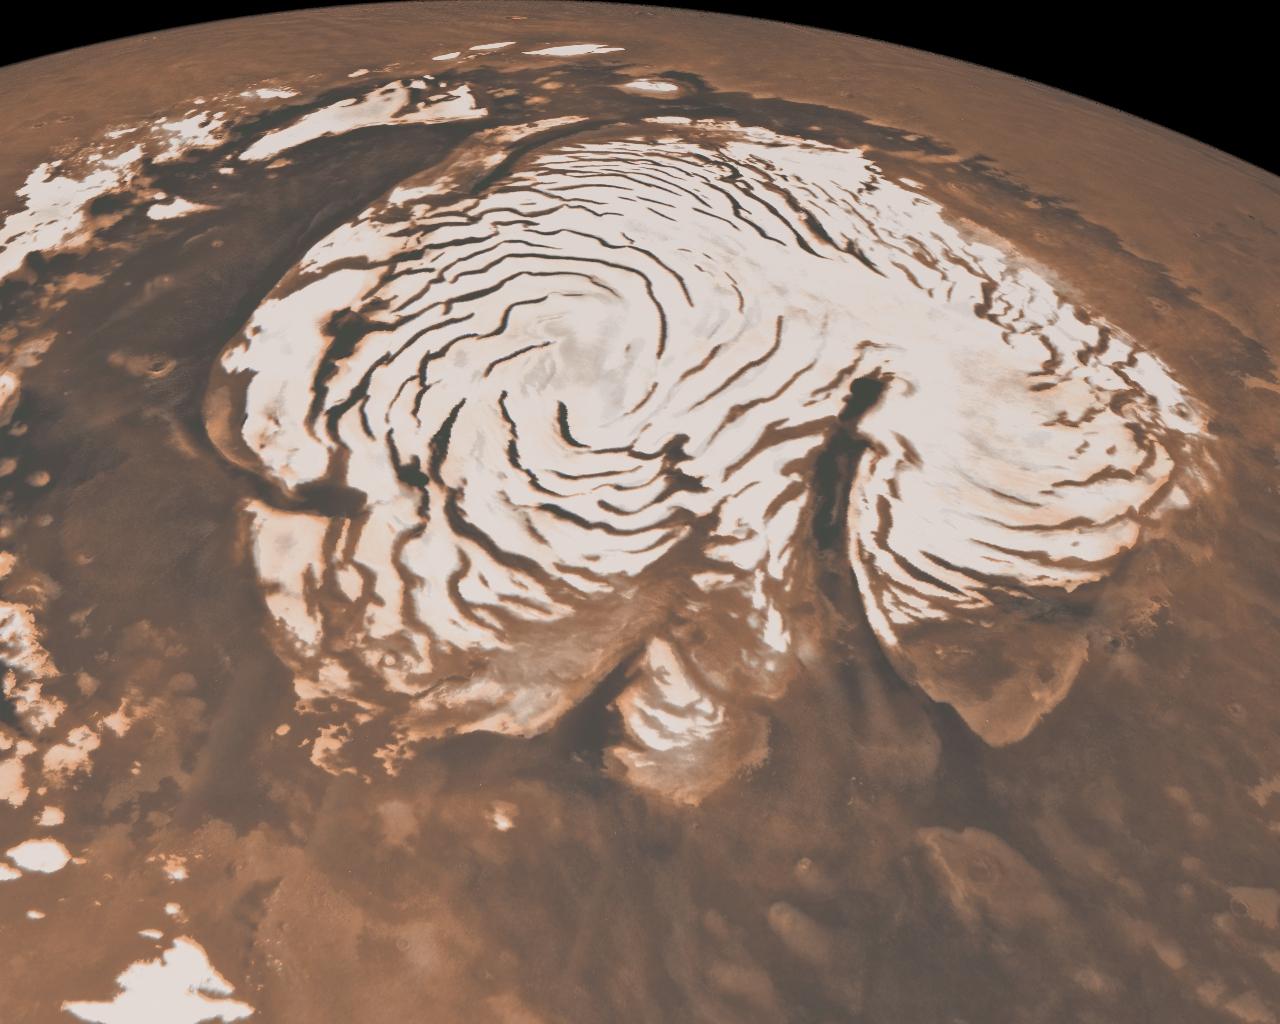 Mars North Pole Ice Cap. Image Credit: Image Credit: NASA/JPL-Caltech/MSSS